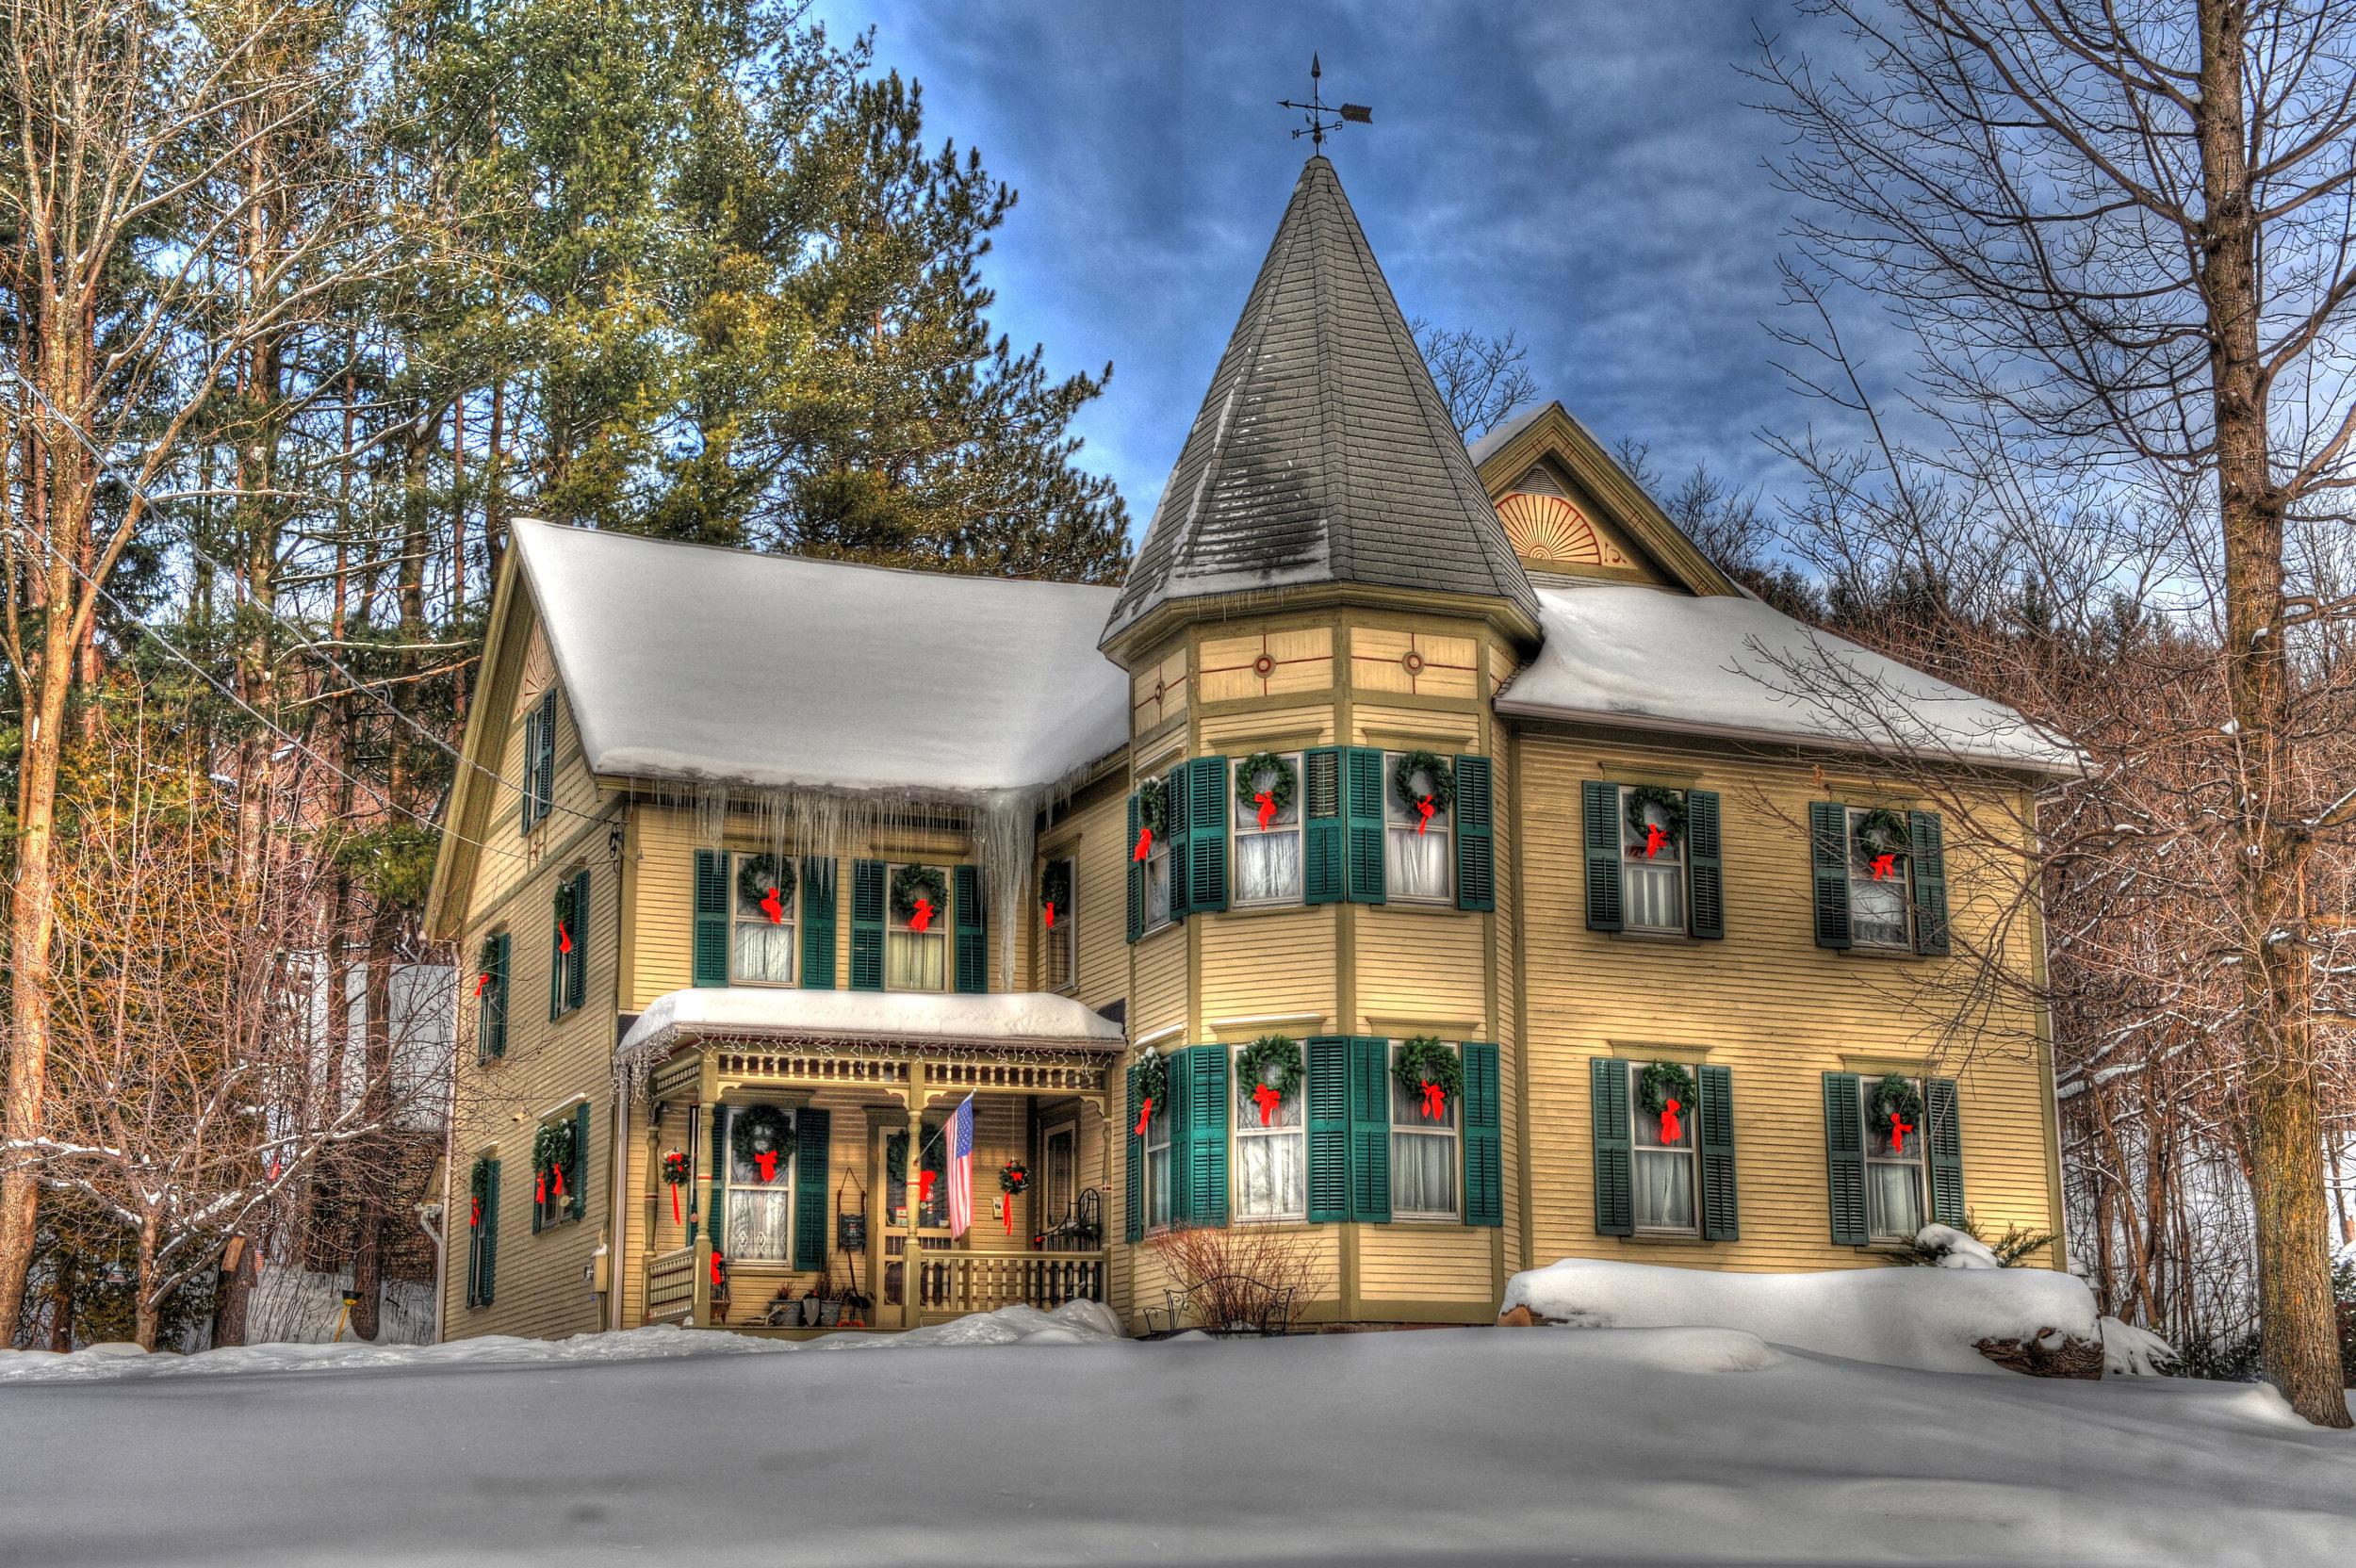 Tonemapped Christmas House Richmond.jpg